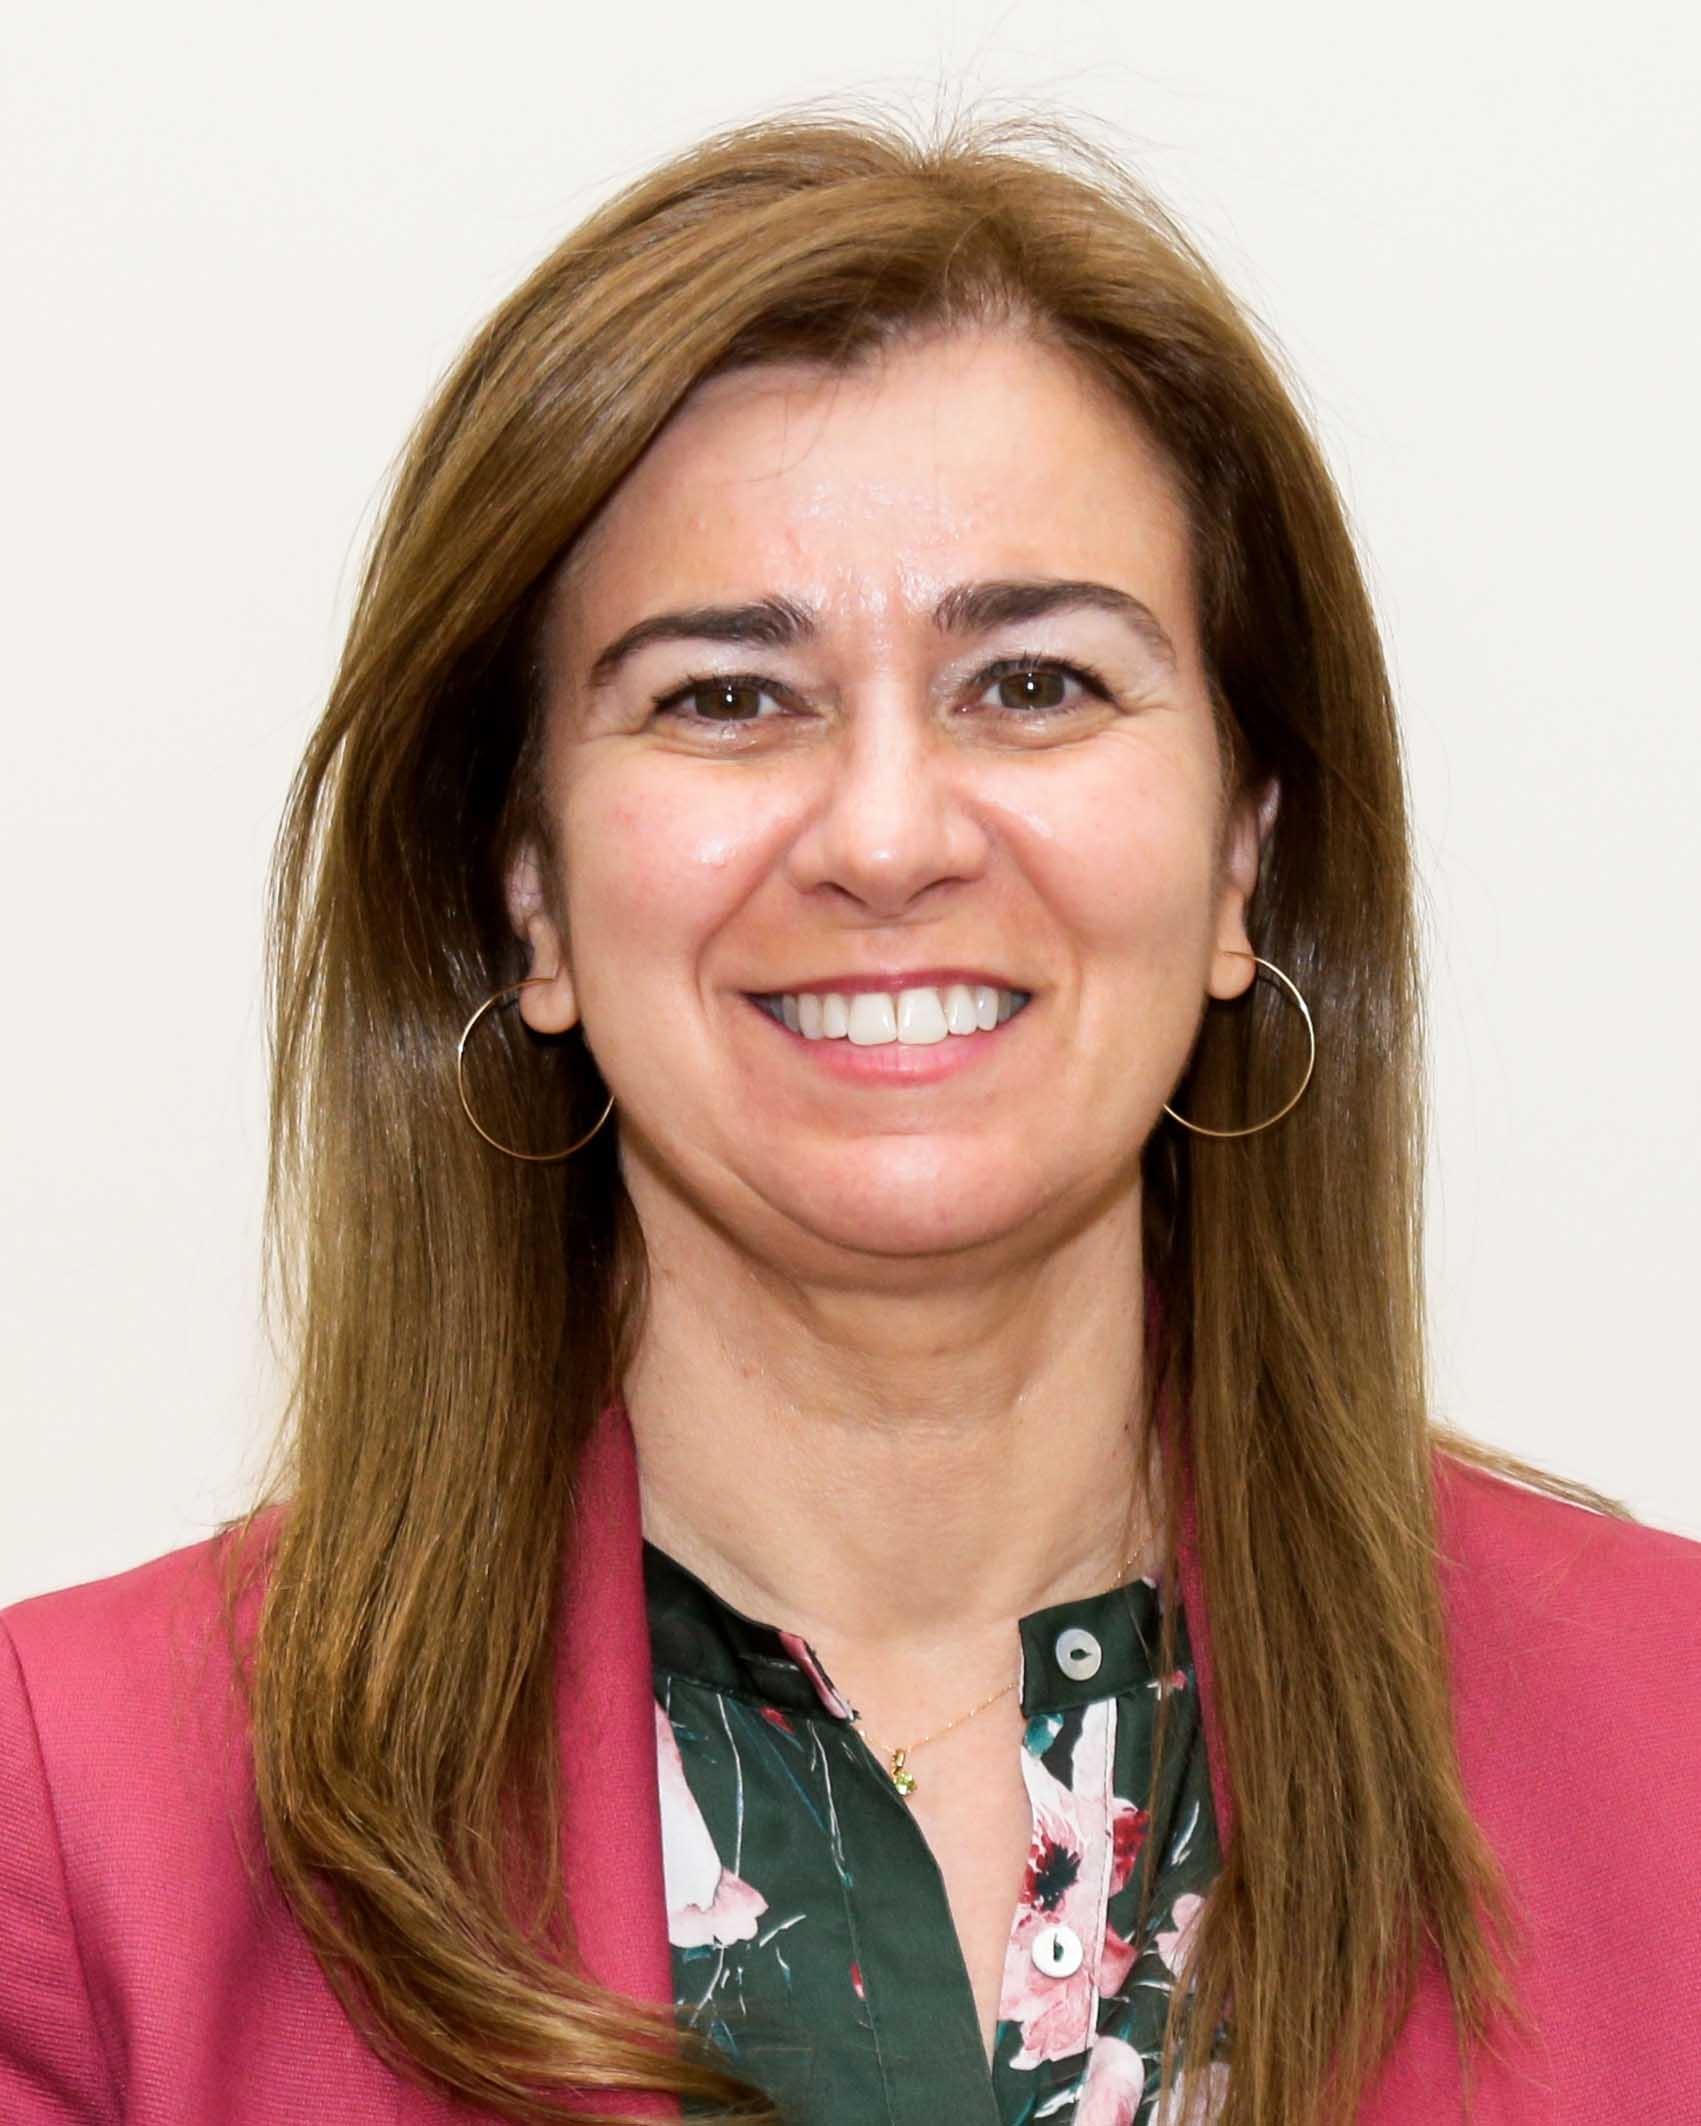 Fotografía de MARÍA TERESA RUIZ-SILLERO BERNAL